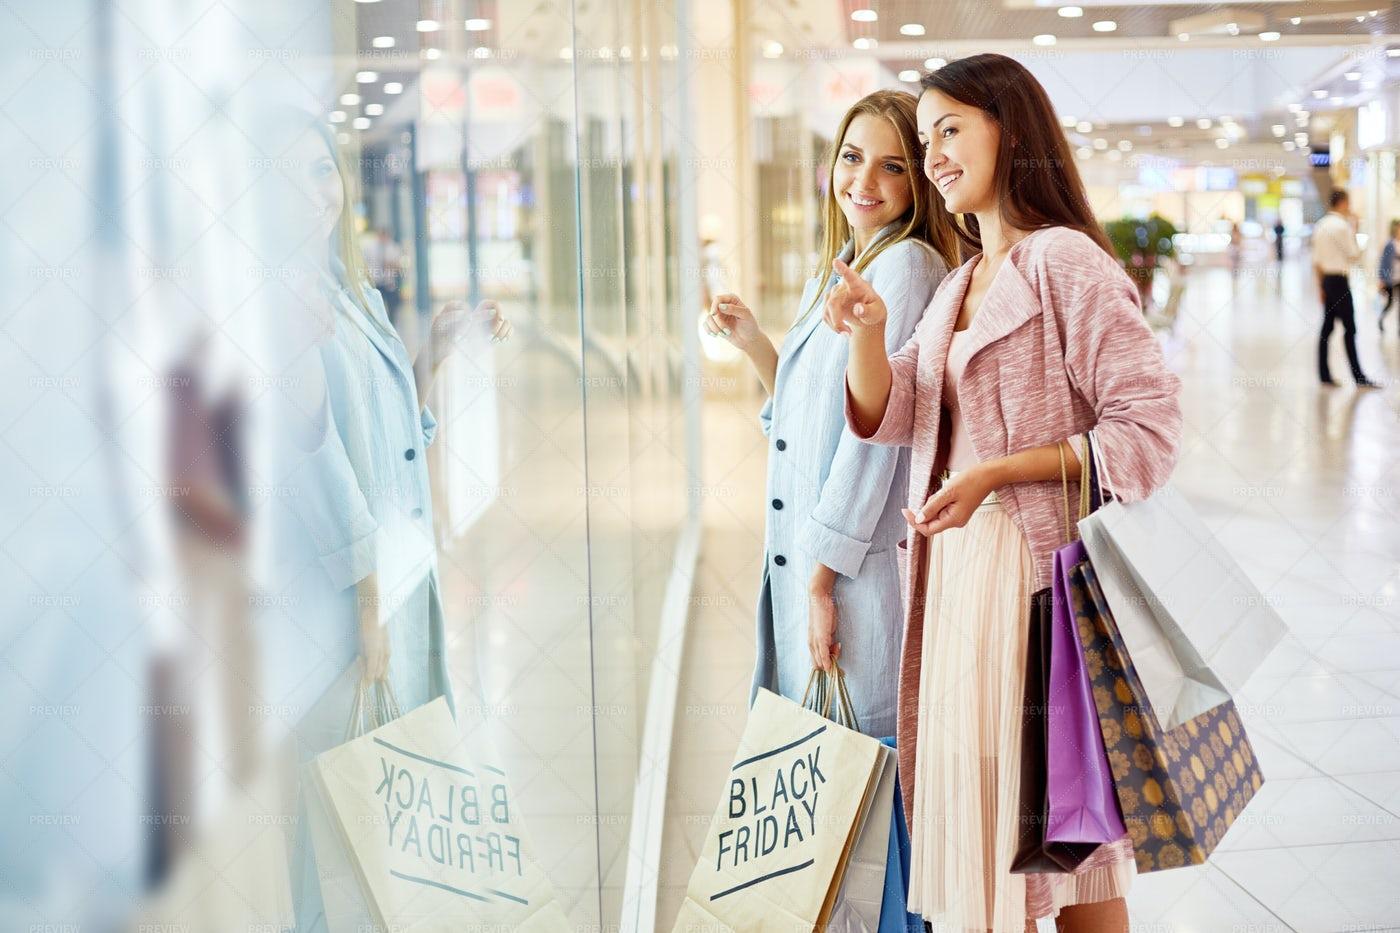 Young Women Window Shopping In Mall: Stock Photos